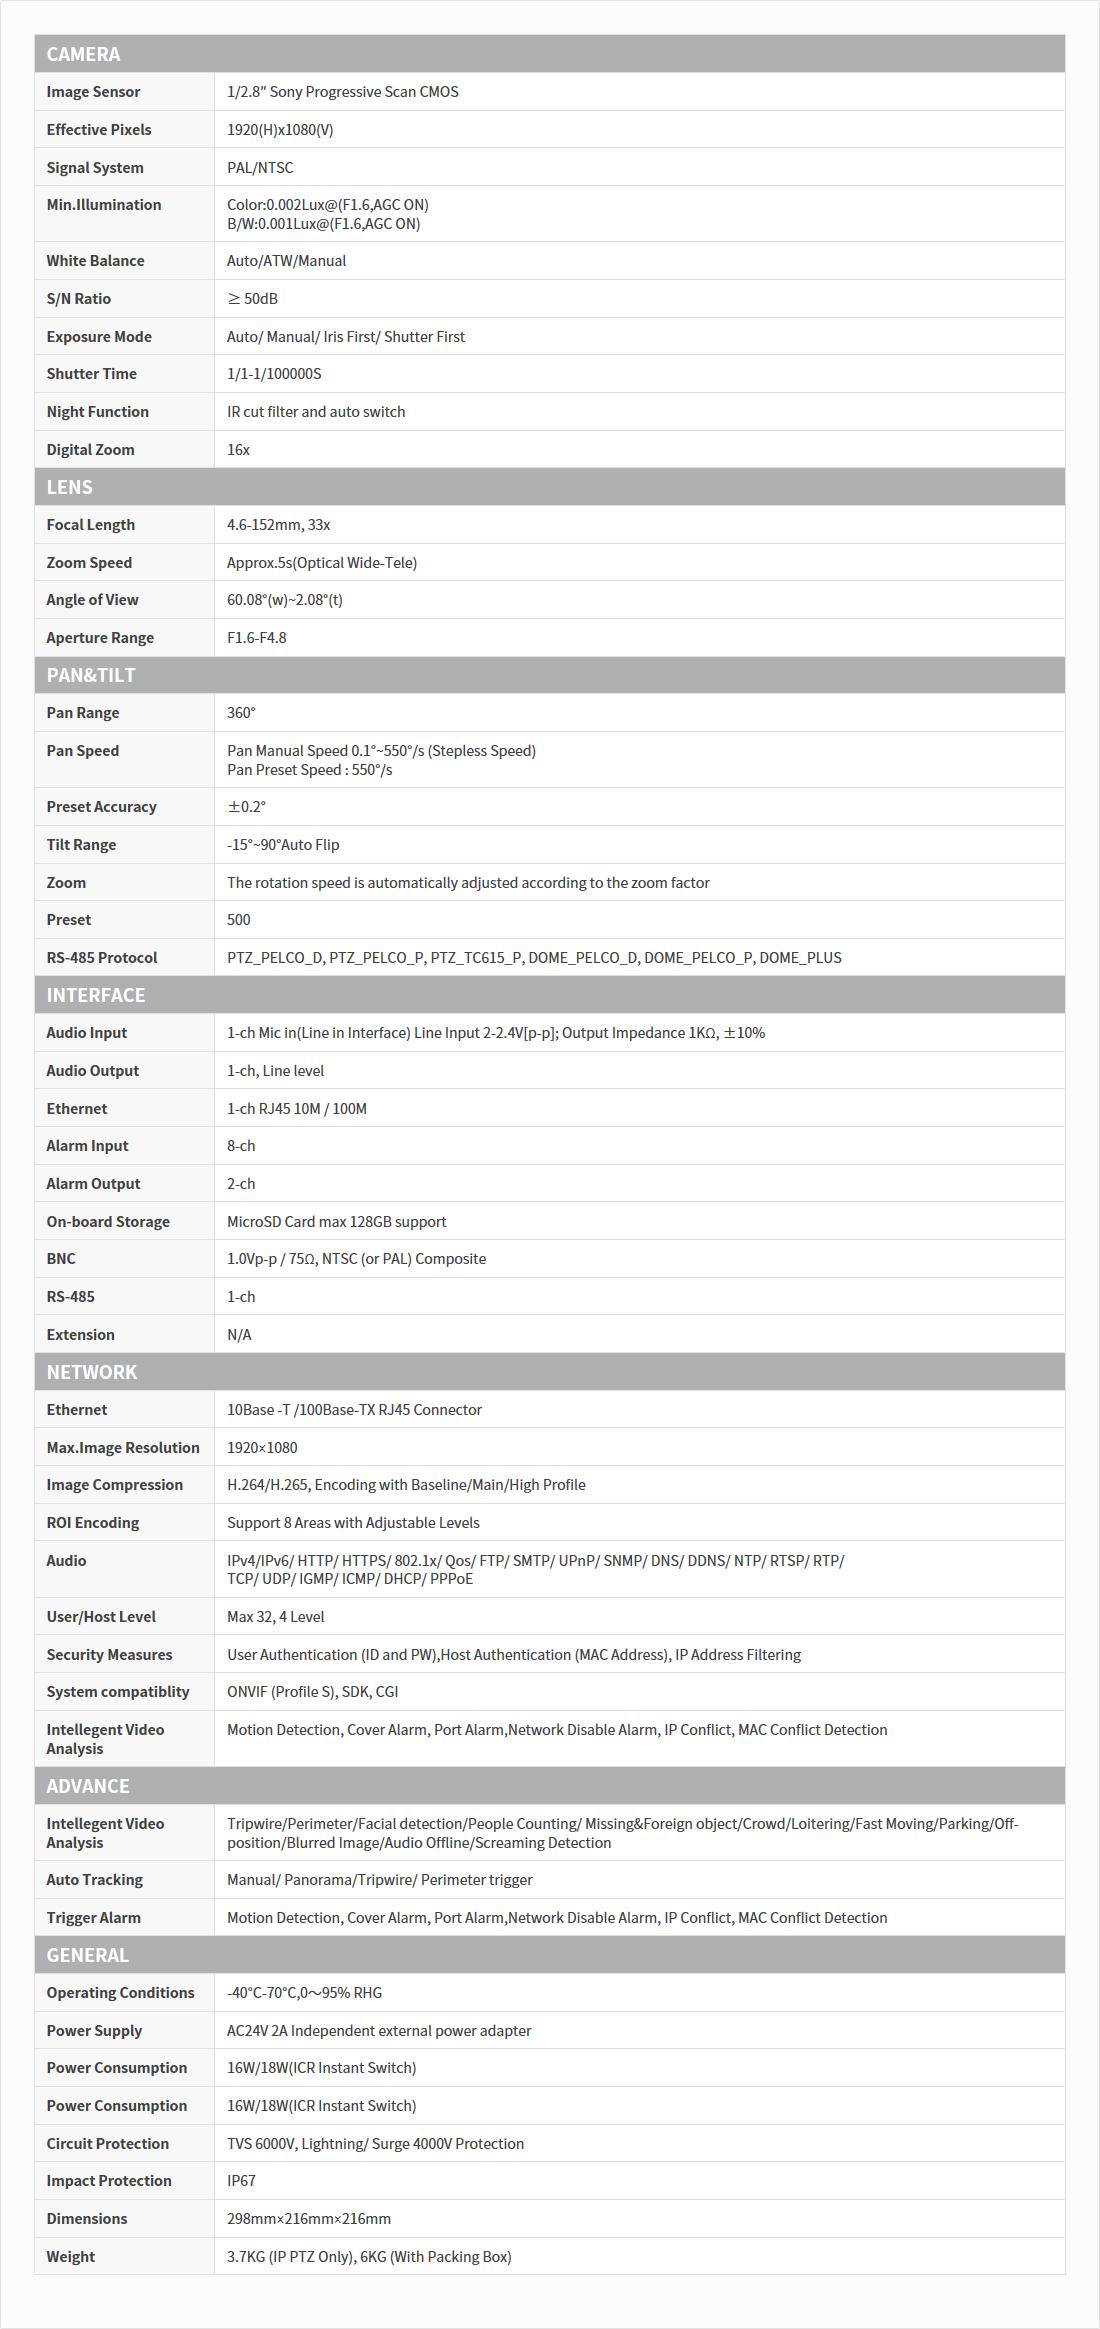 YOUNGKOOK 2.0 Megapixel Network Intellegent type Starlight PTZ Camera (33X zoom) YSD-SD220MH